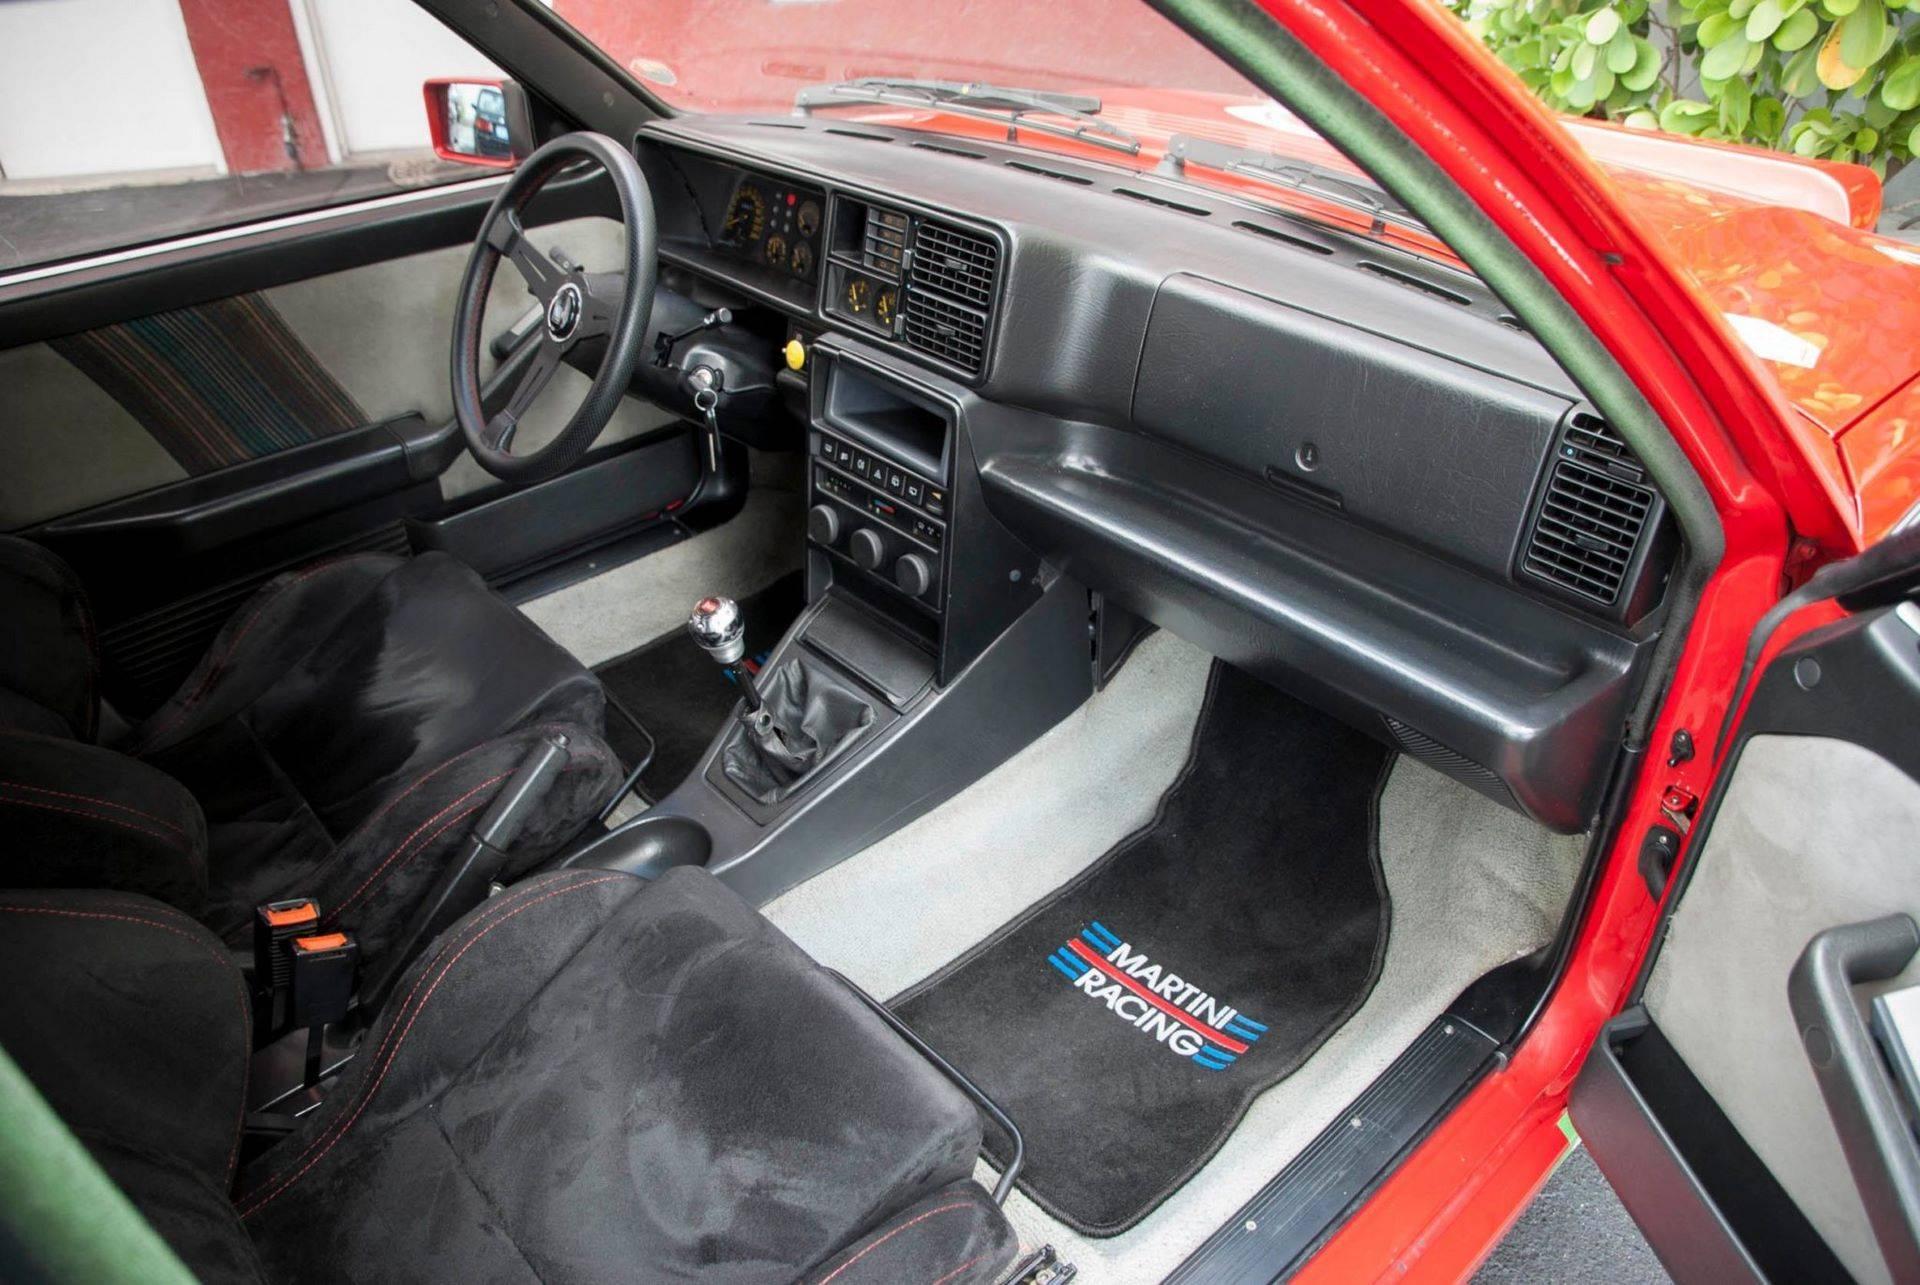 Lancia-Delta-Integrale-8V-1989-48